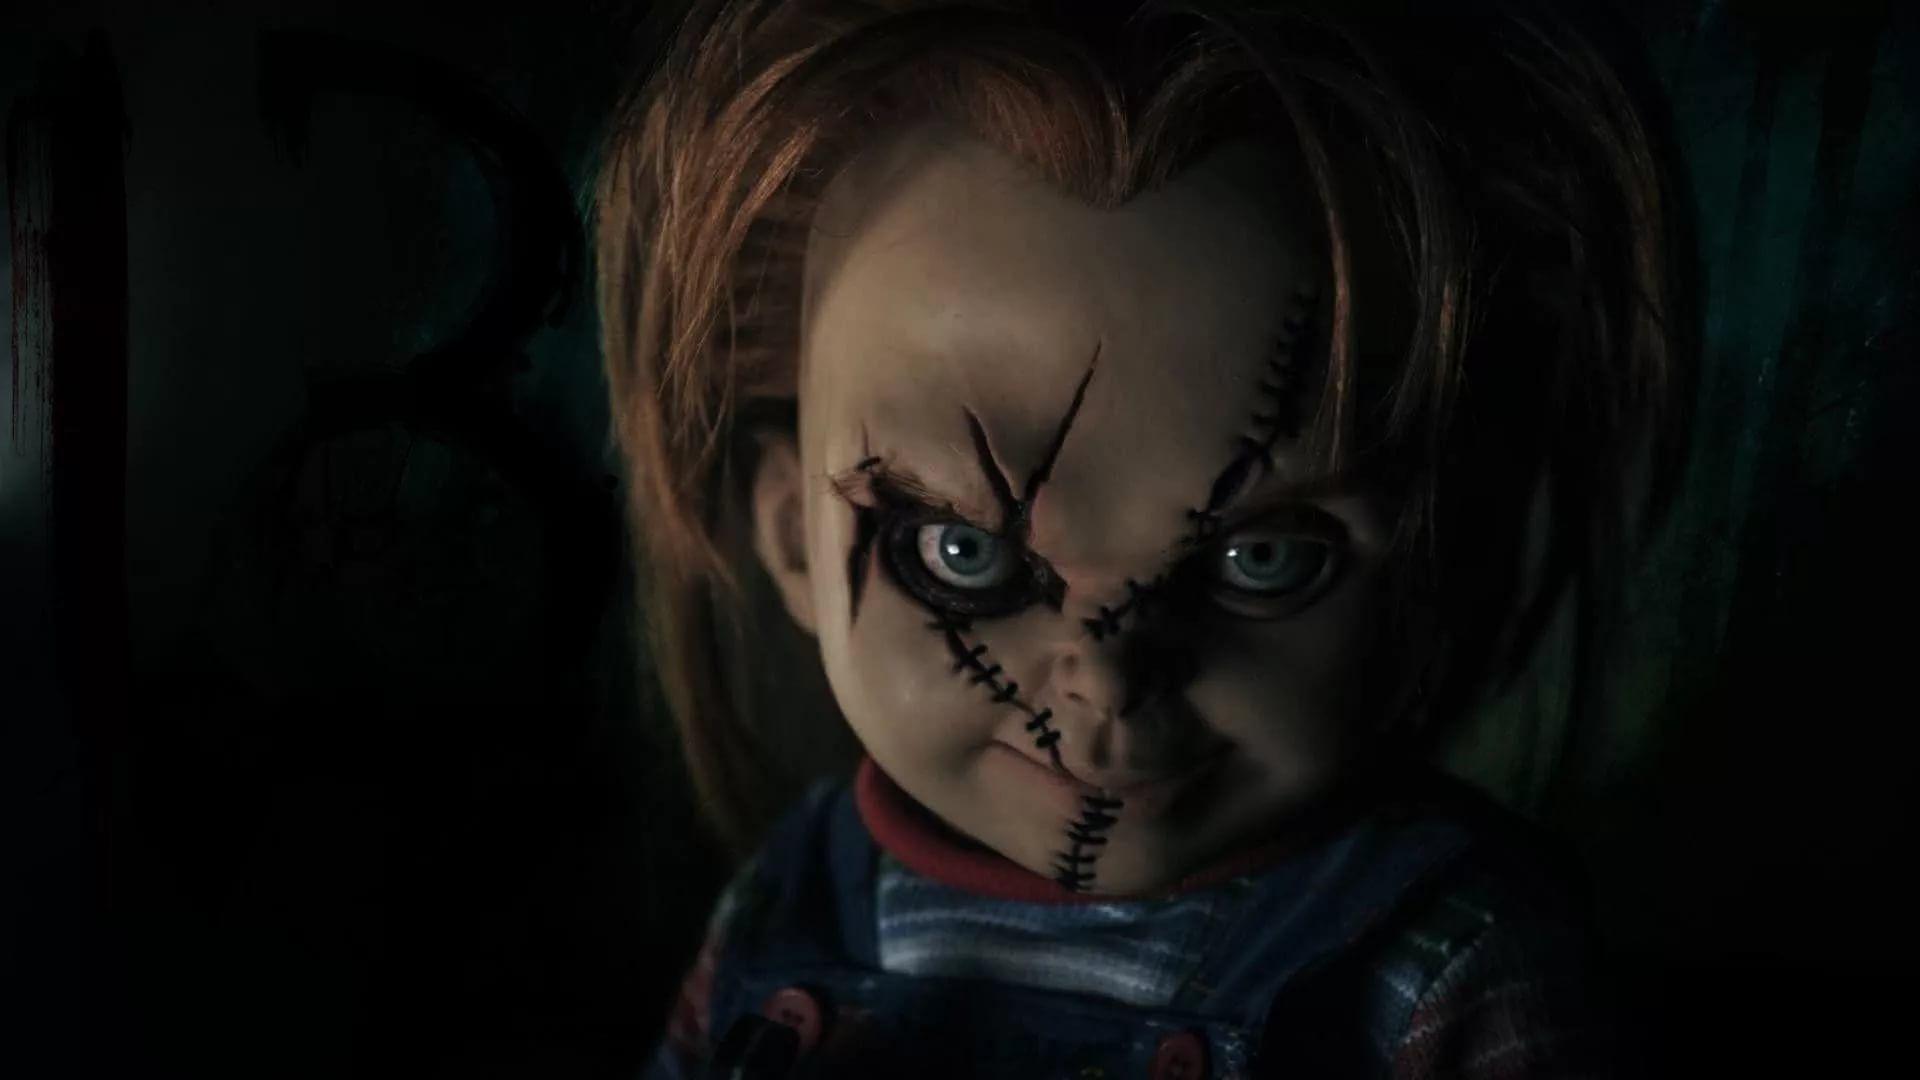 Chucky Doll Good Wallpaper